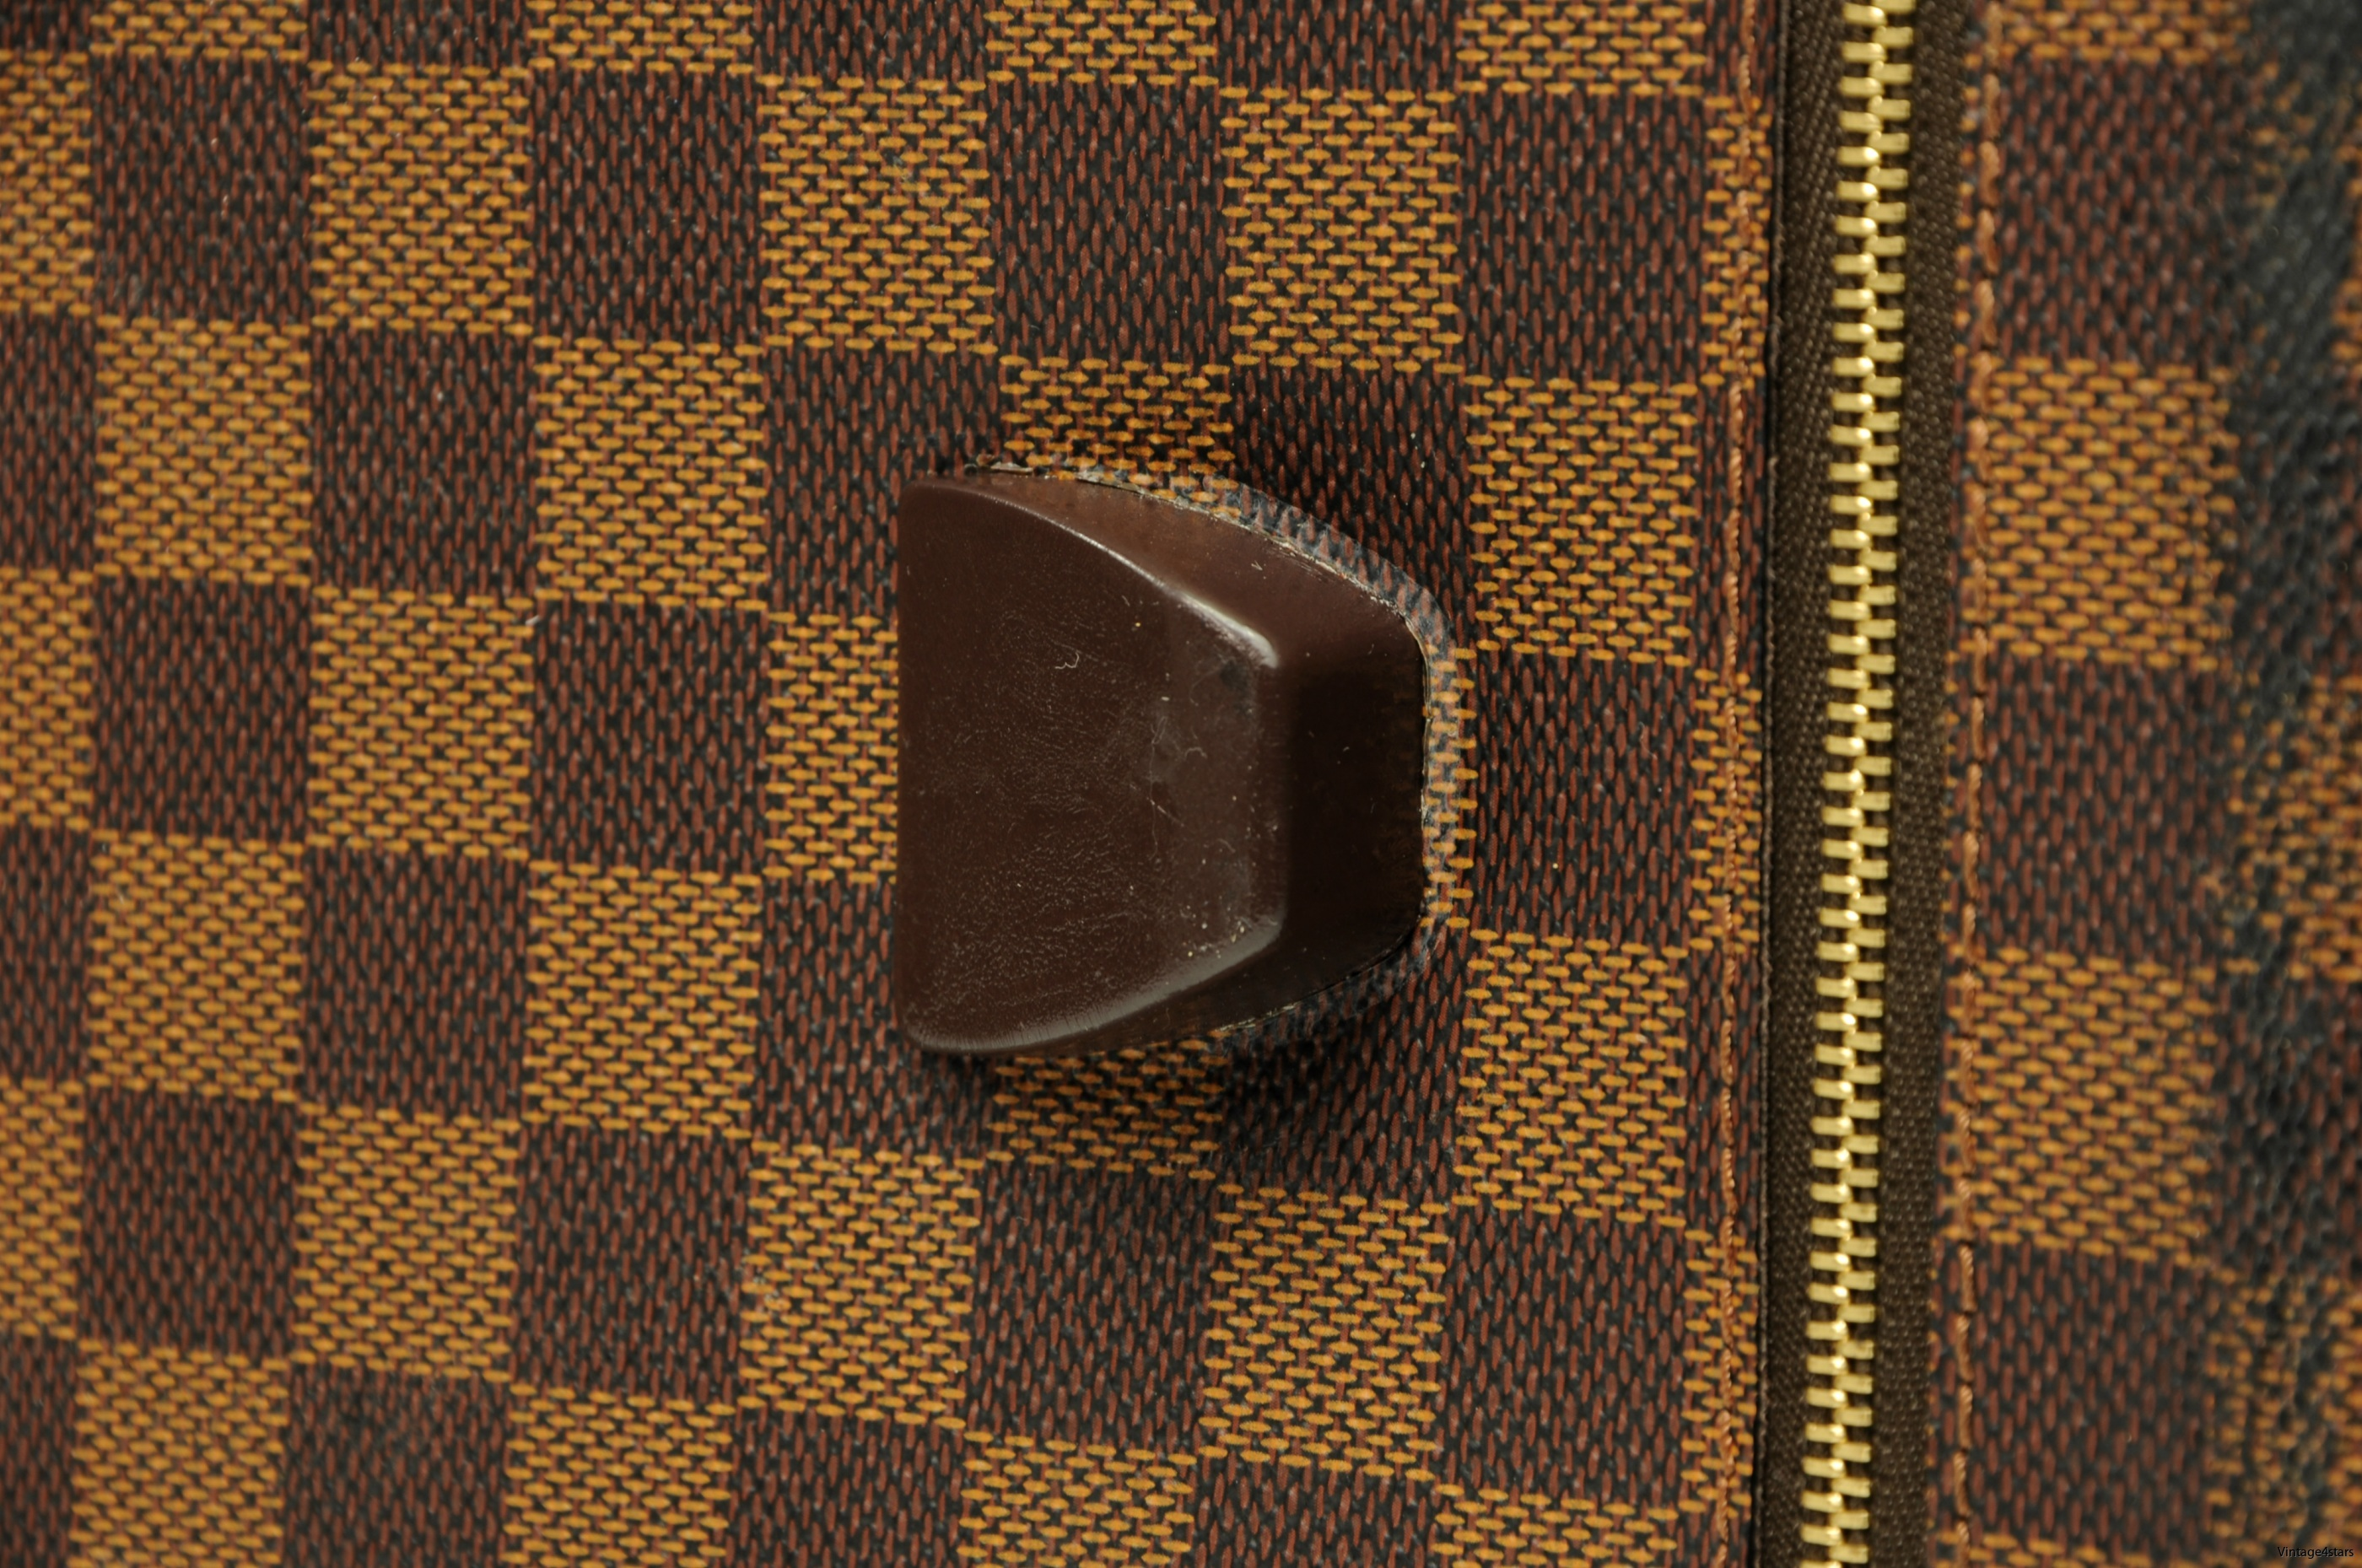 Louis Vuitton Eole 60 Damier Ebene 16